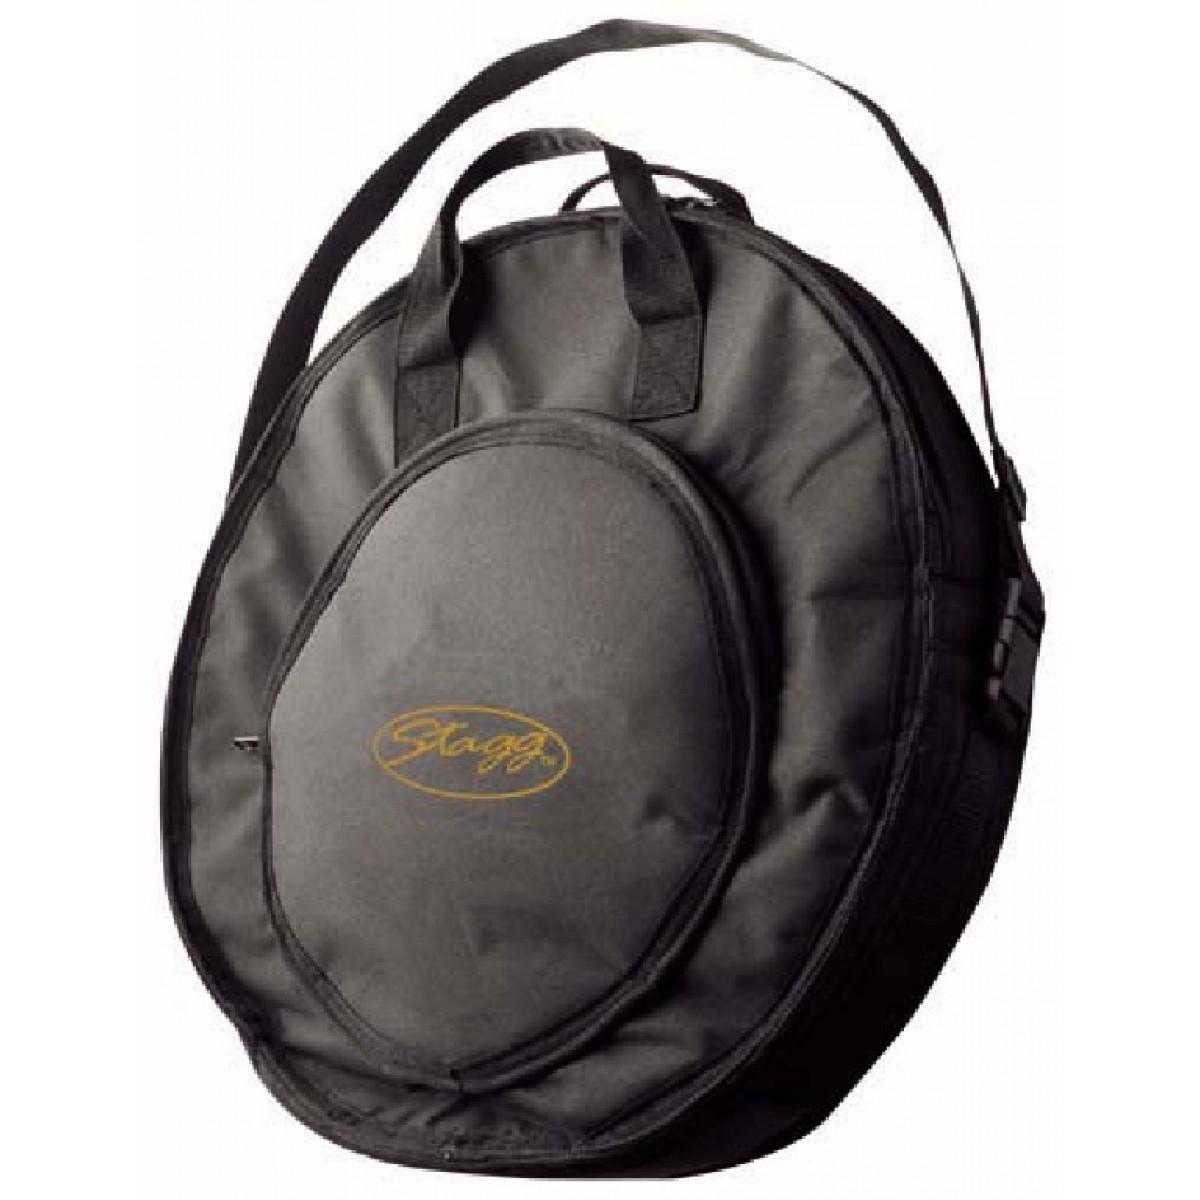 Beckentasche 4 Fächer